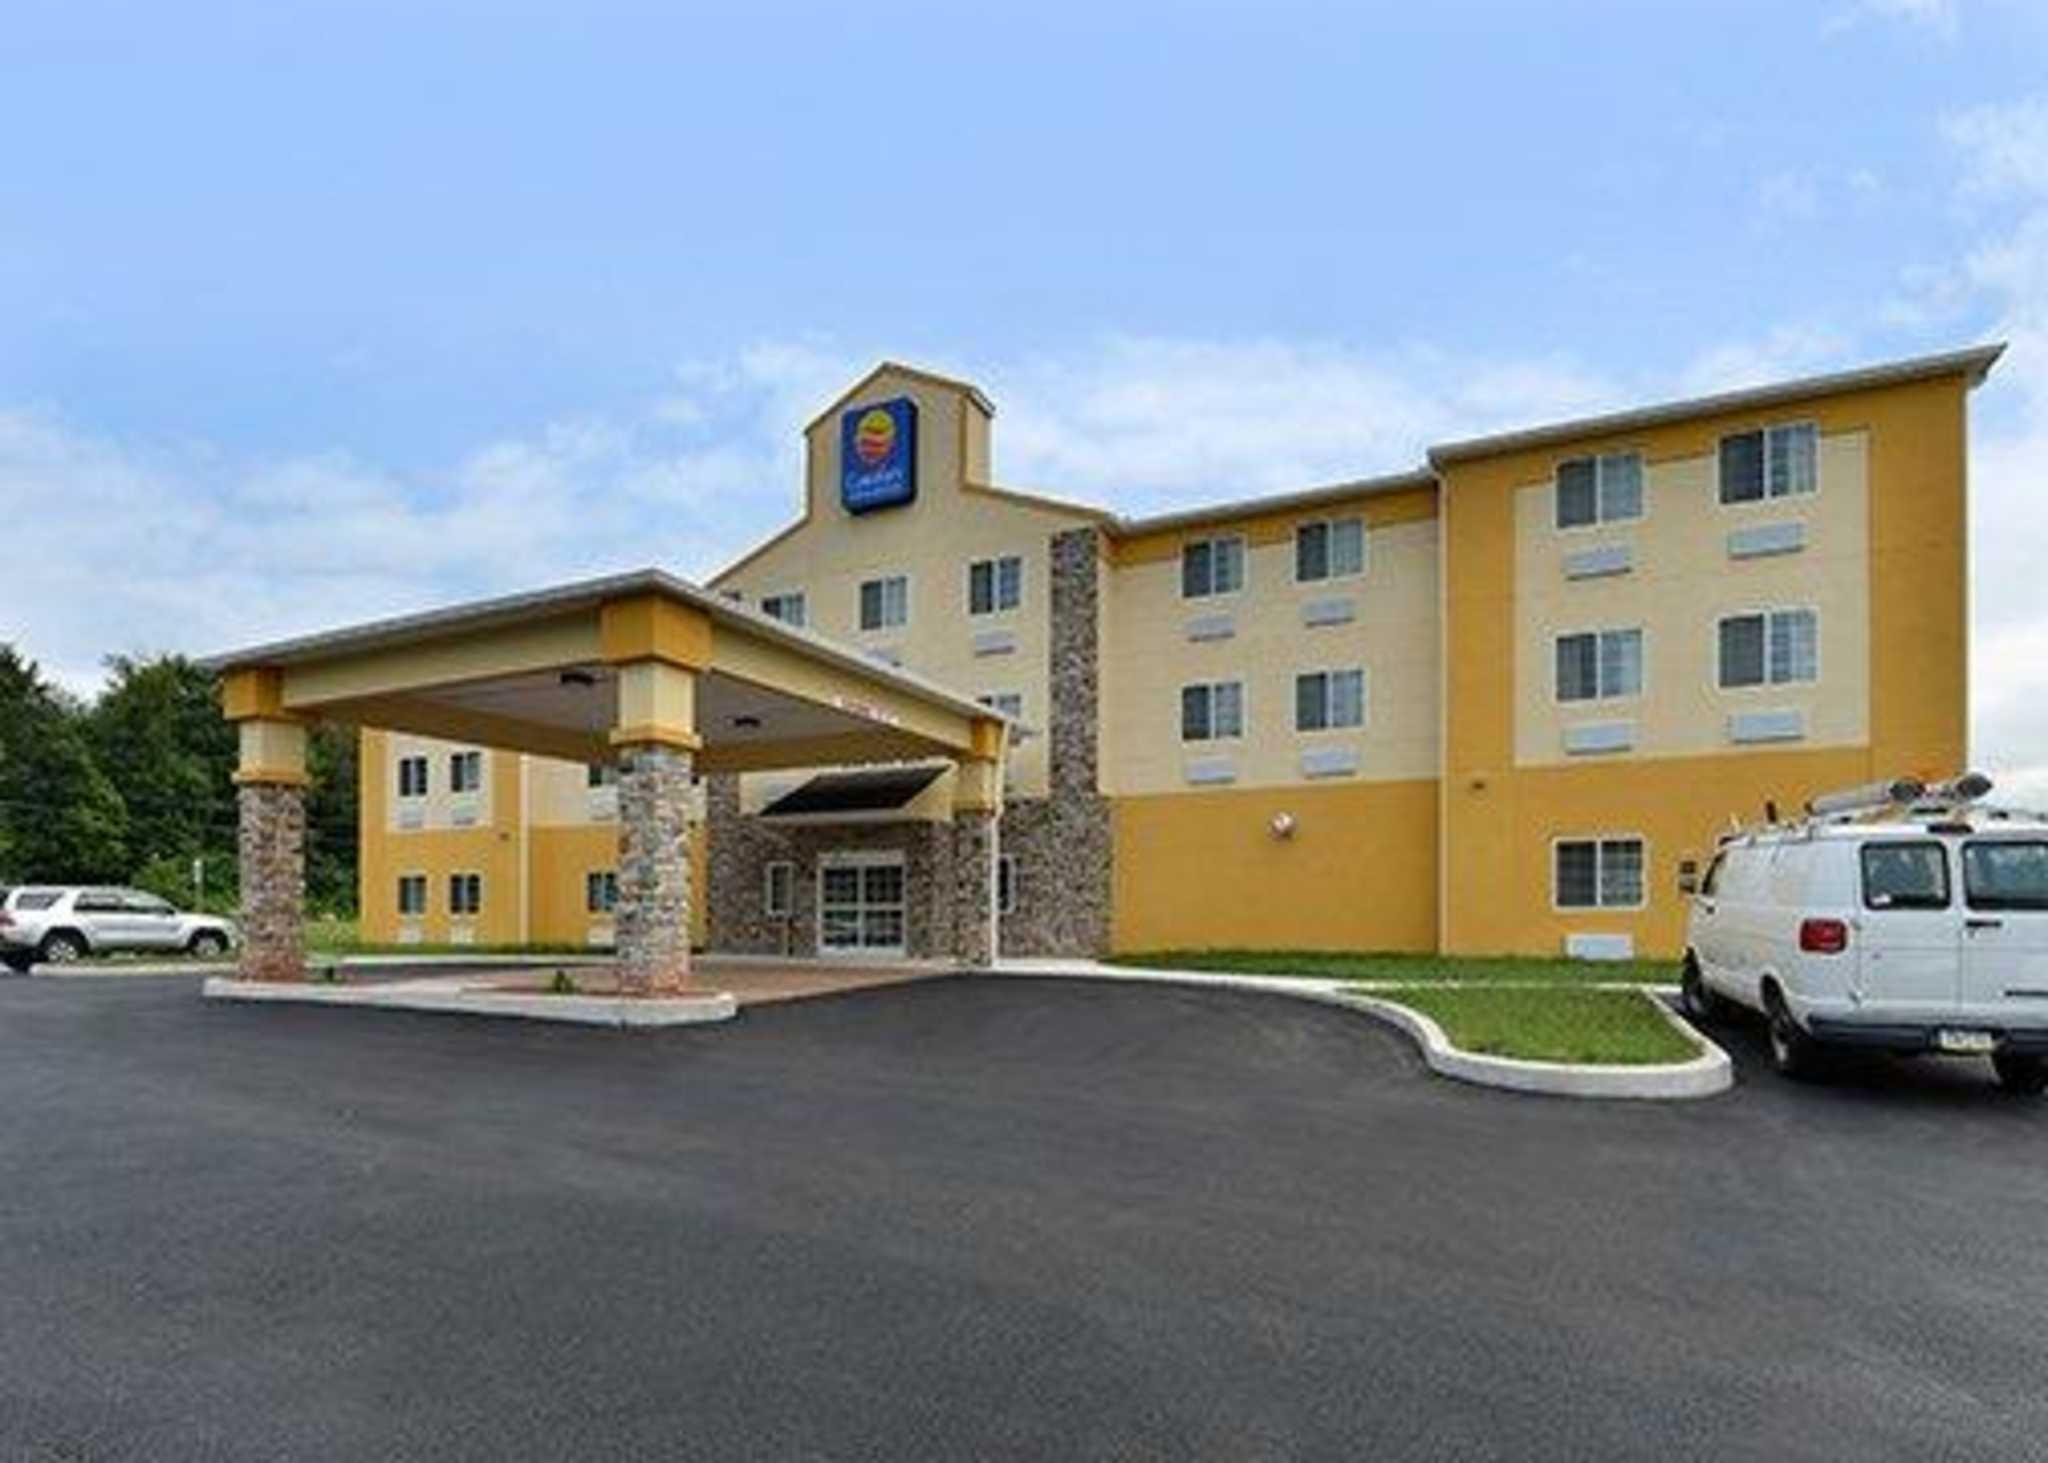 Comfort Inn Amp Suites Manheim Lebanon Manheim Pa Www